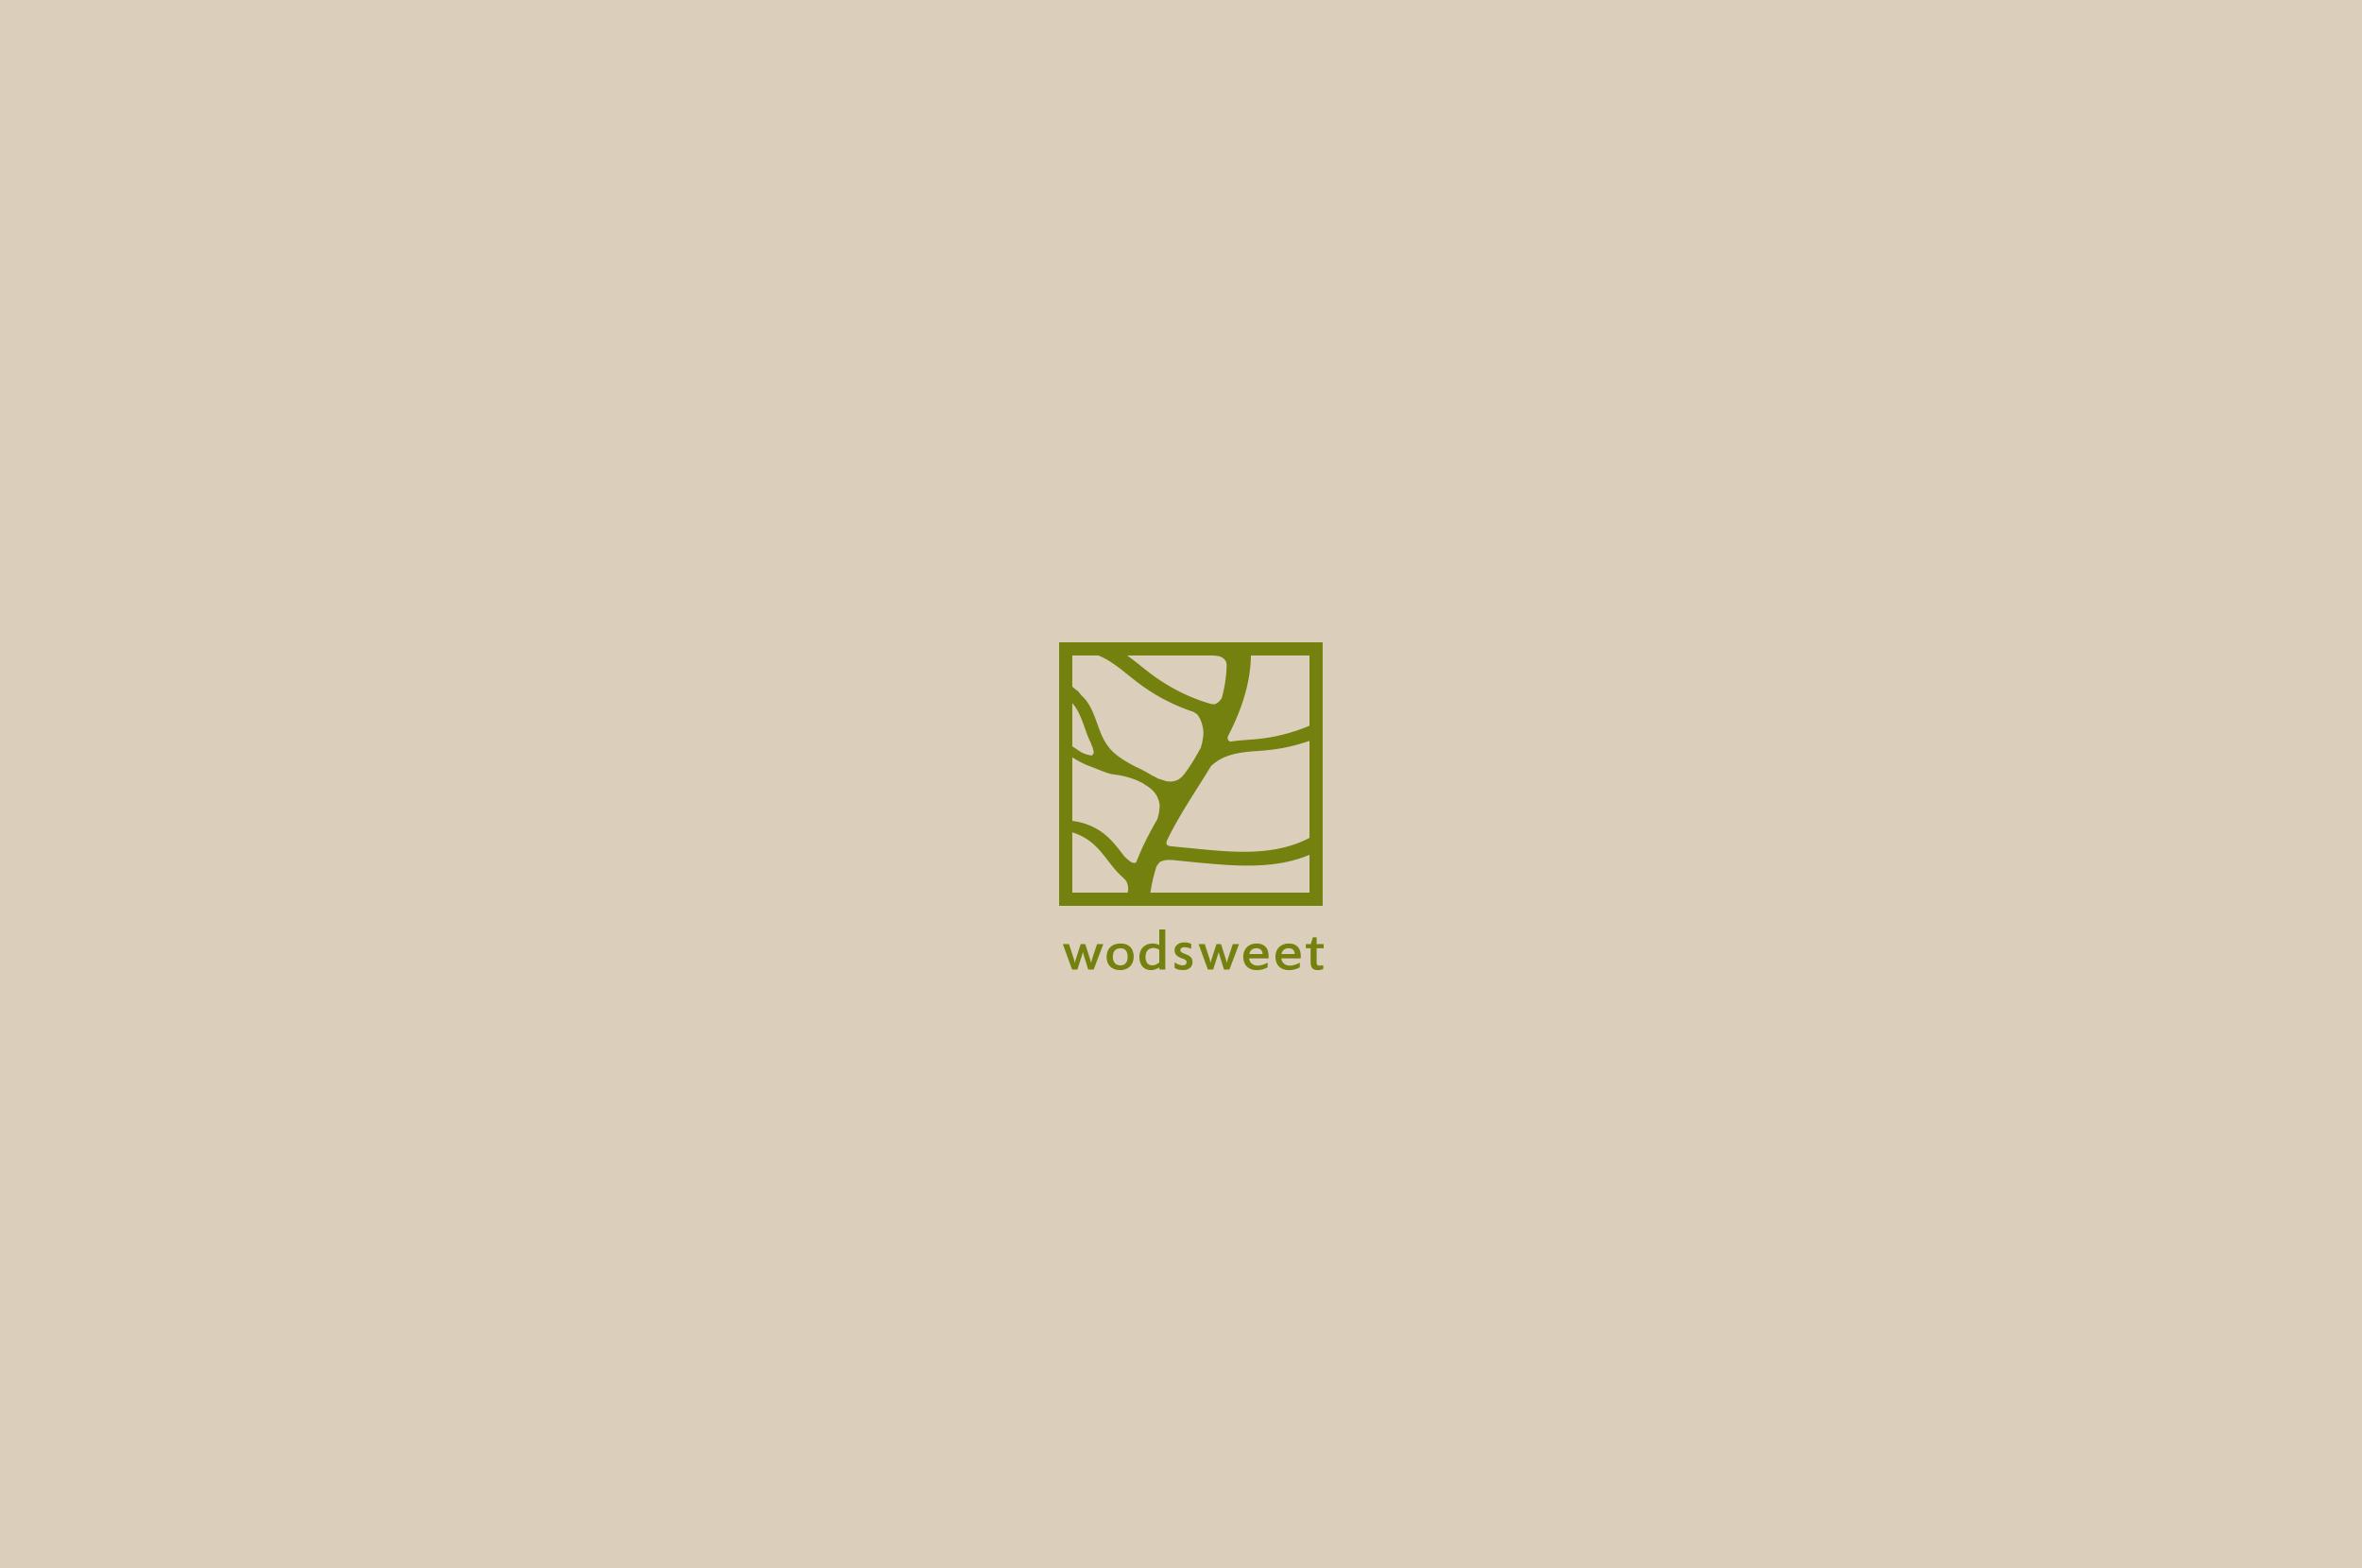 【wodsweet】甜品店品牌形象设计|平面|标志|王2木